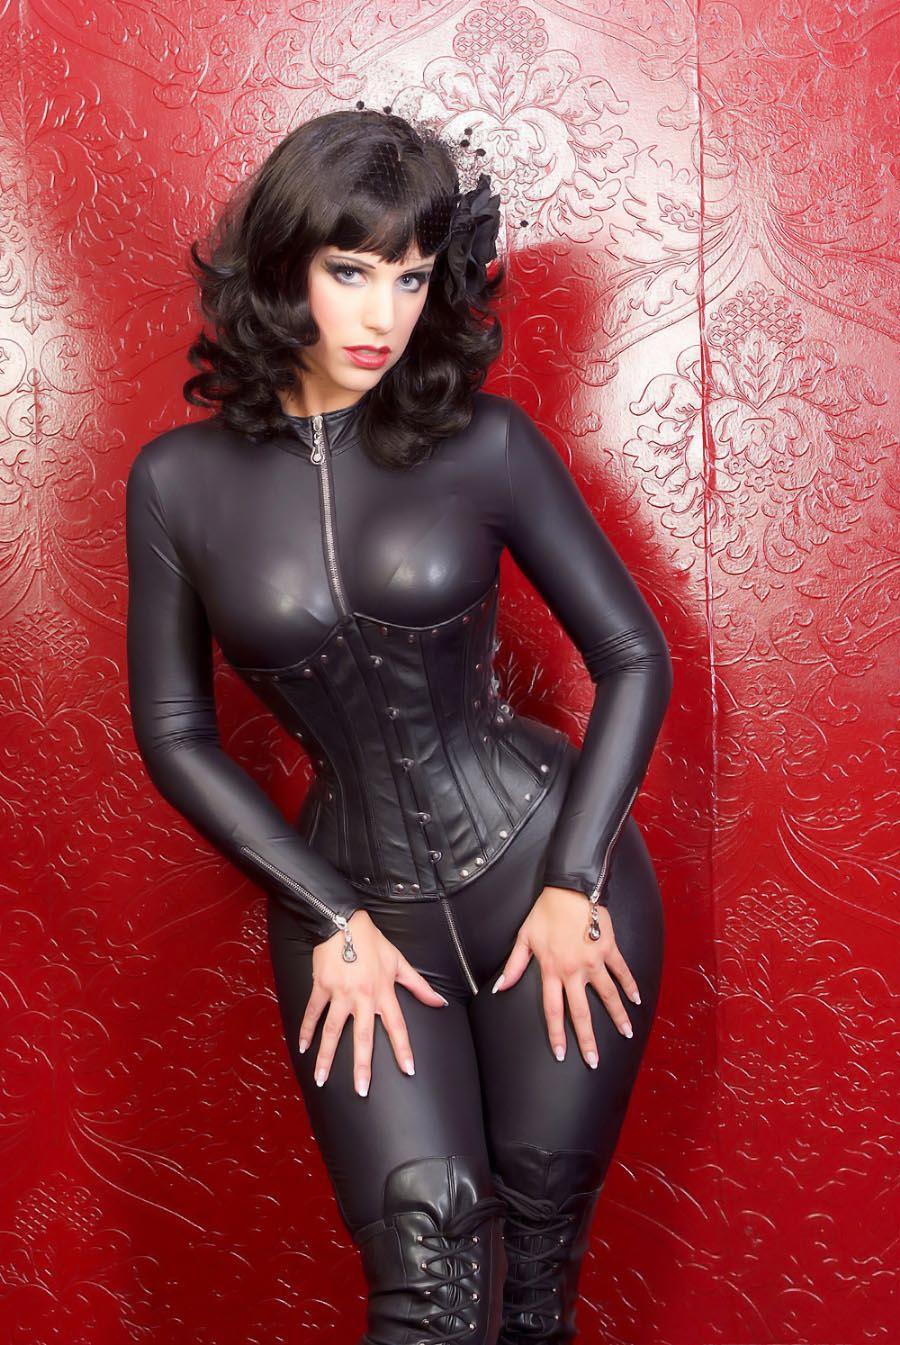 sexy+tight+corset+(56).jpg